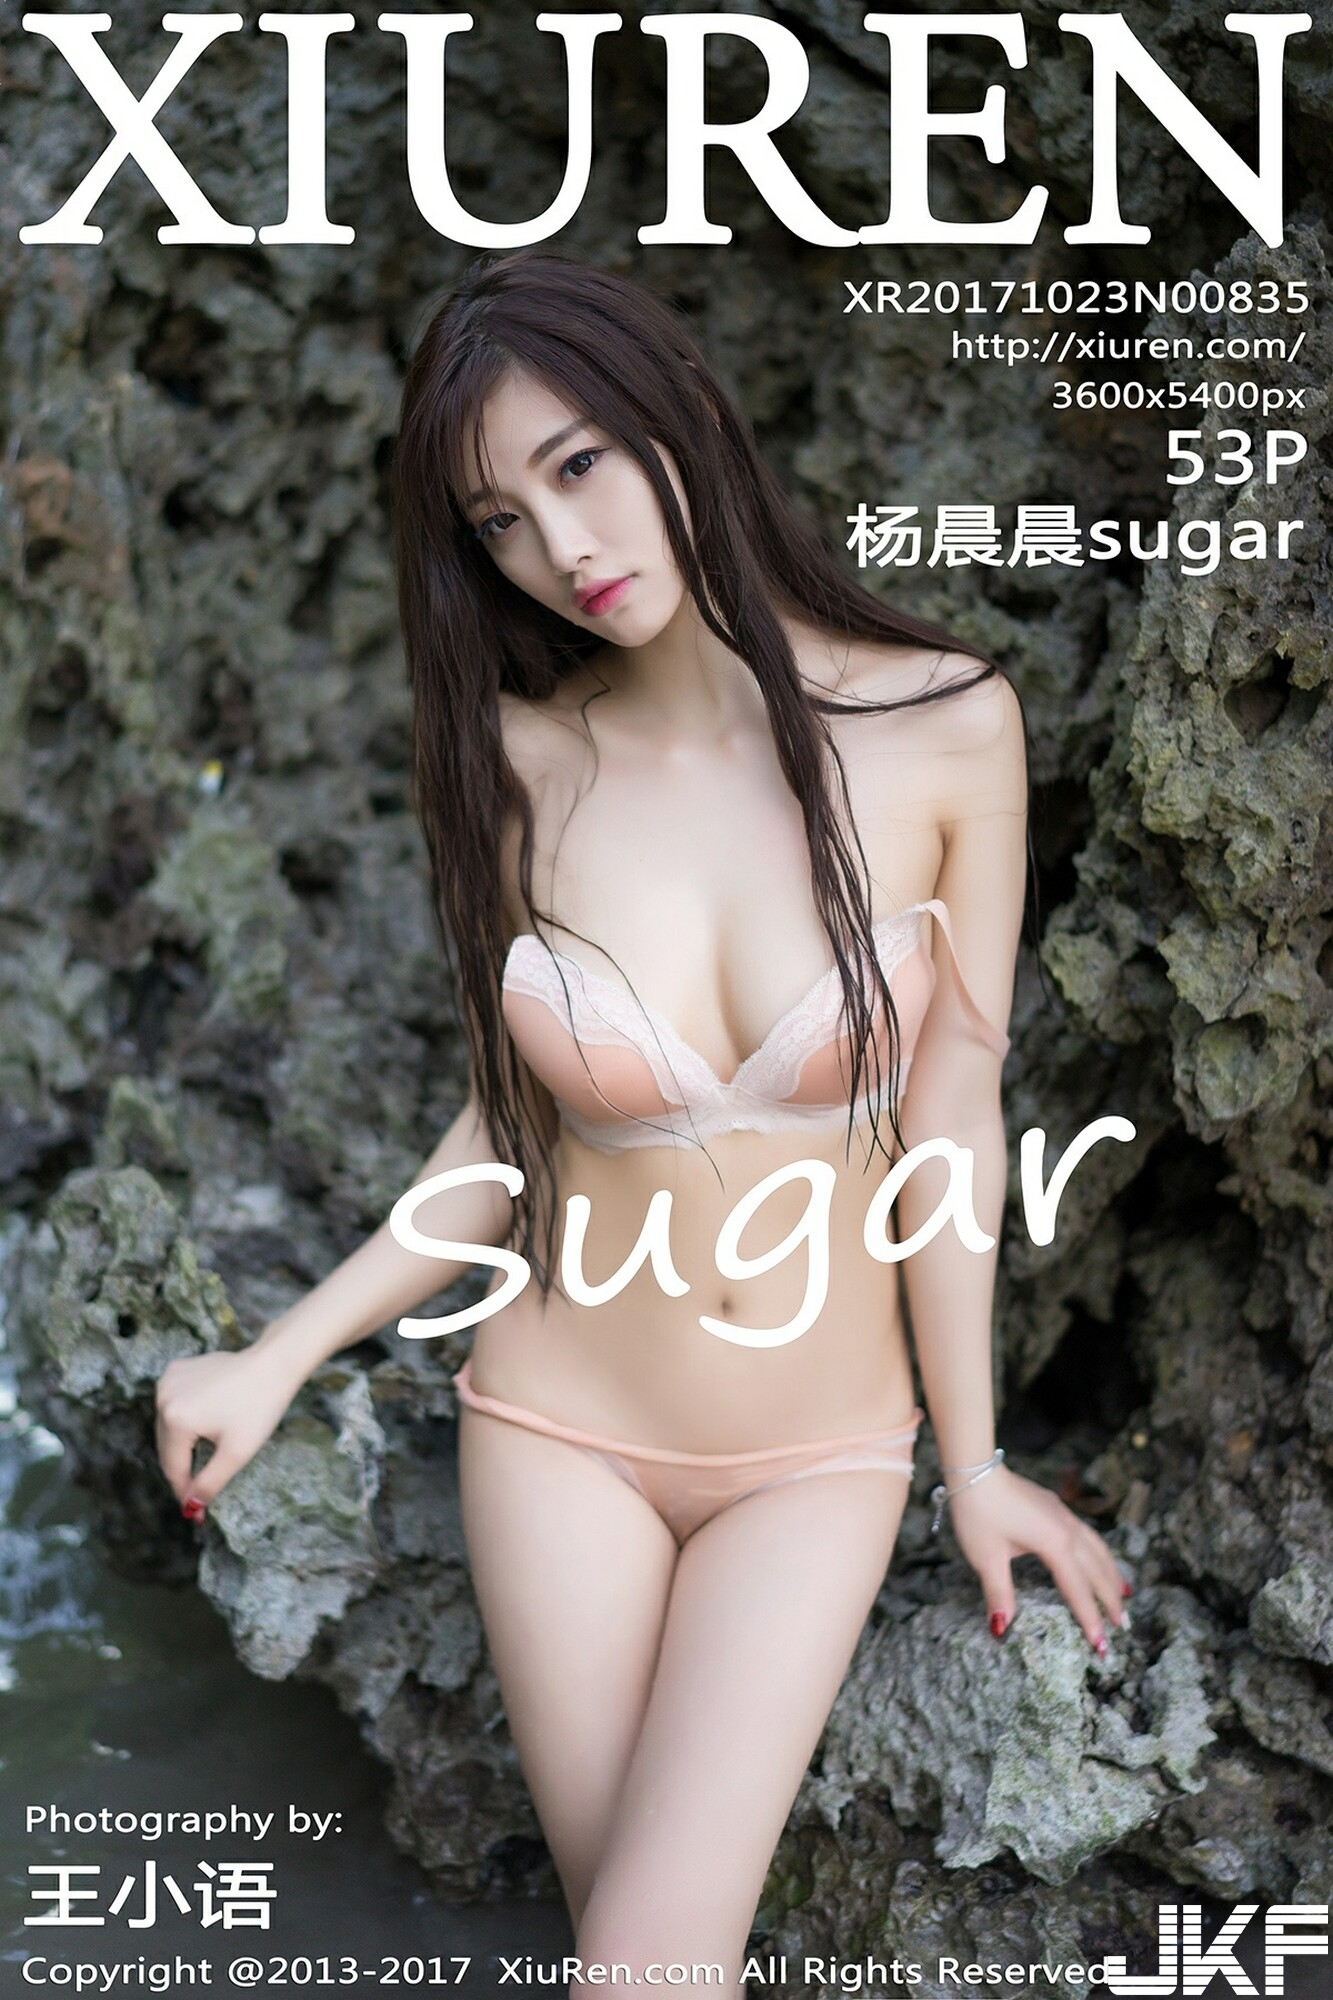 【Xiuren秀人網】No.835 楊晨晨Sugar 性感寫真 - 貼圖 - 清涼寫真 -